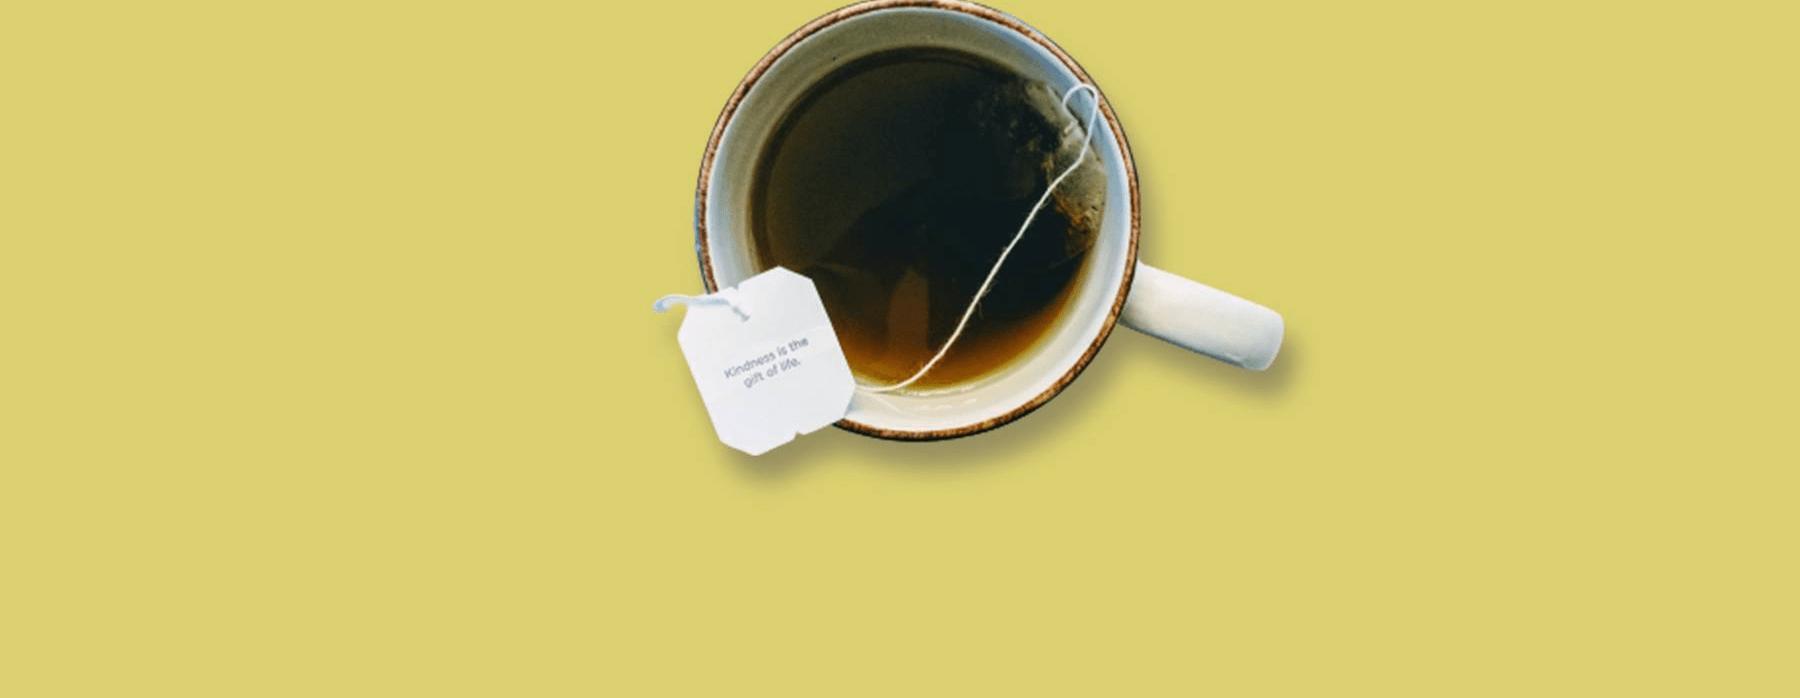 15 remedios naturales para dormir mejor que debes probar - Featured image